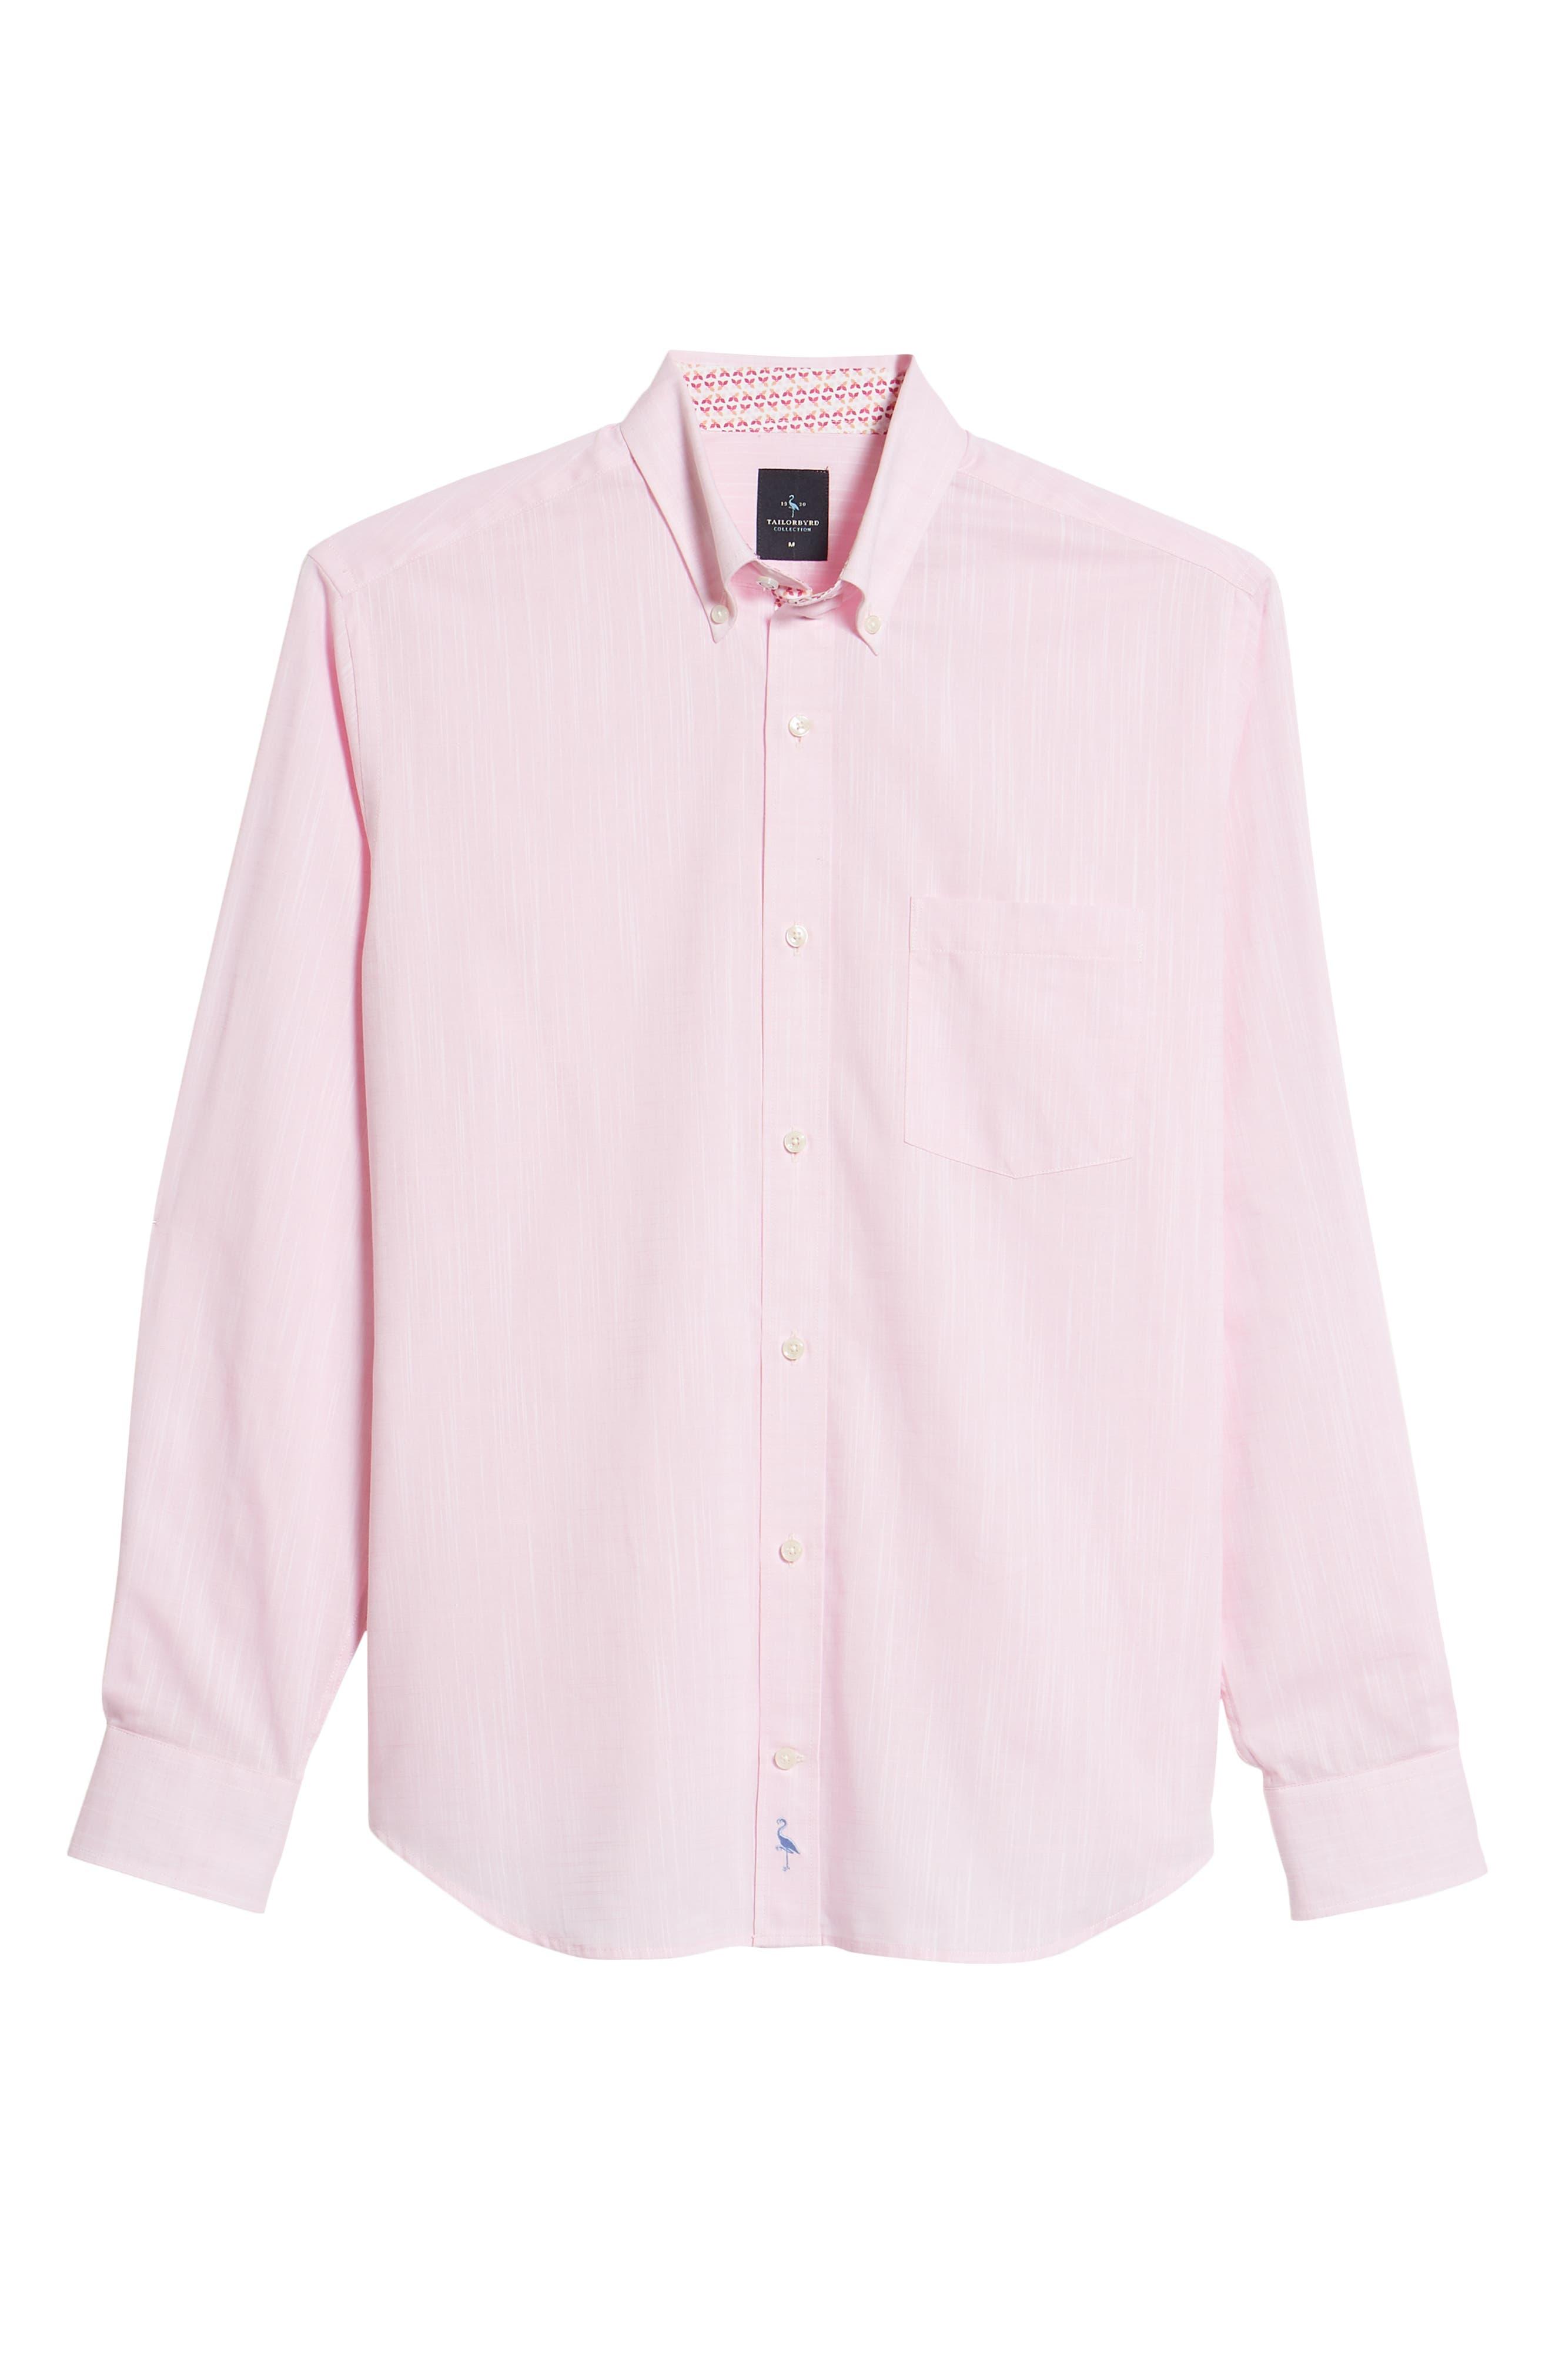 TAILORBYRD,                             Kade Regular Fit Sport Shirt,                             Alternate thumbnail 6, color,                             650